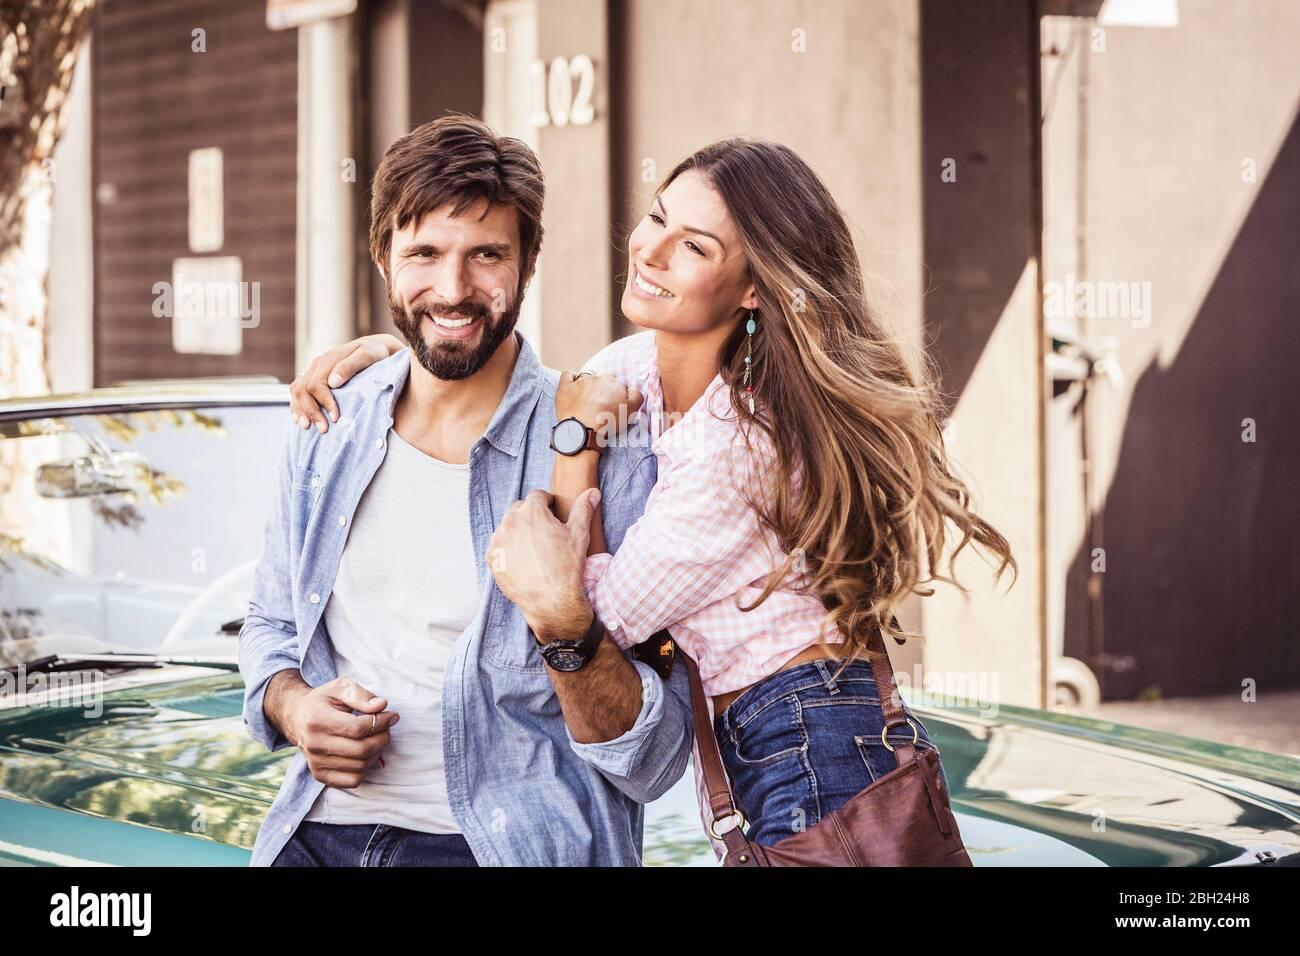 Feliz pareja en un coche convertible fuera de casa Foto de stock